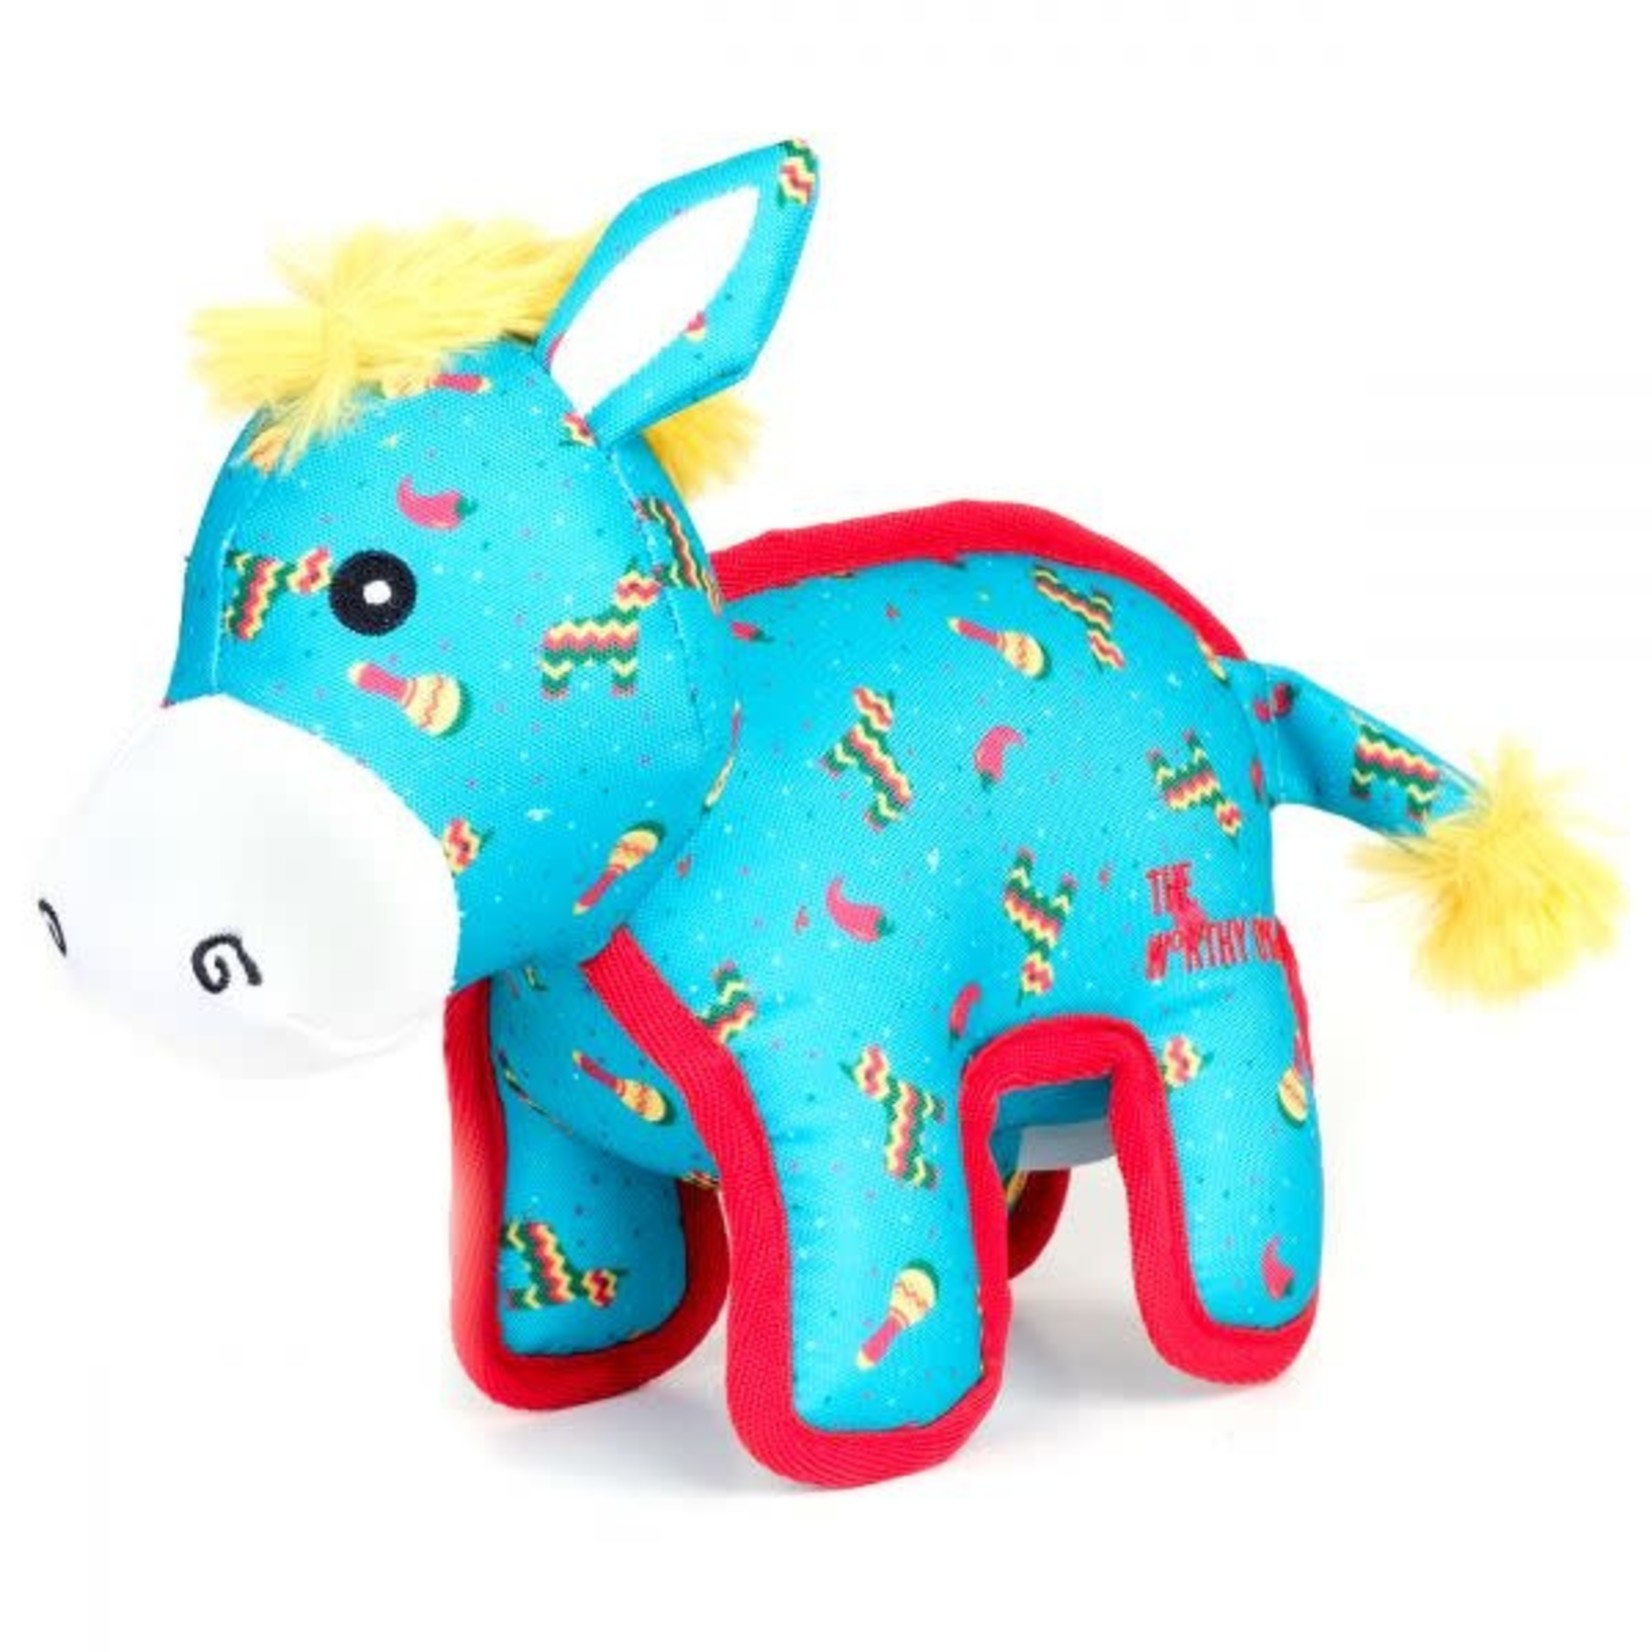 The Worthy Dog The Worthy Dog Pinata Donkey Small